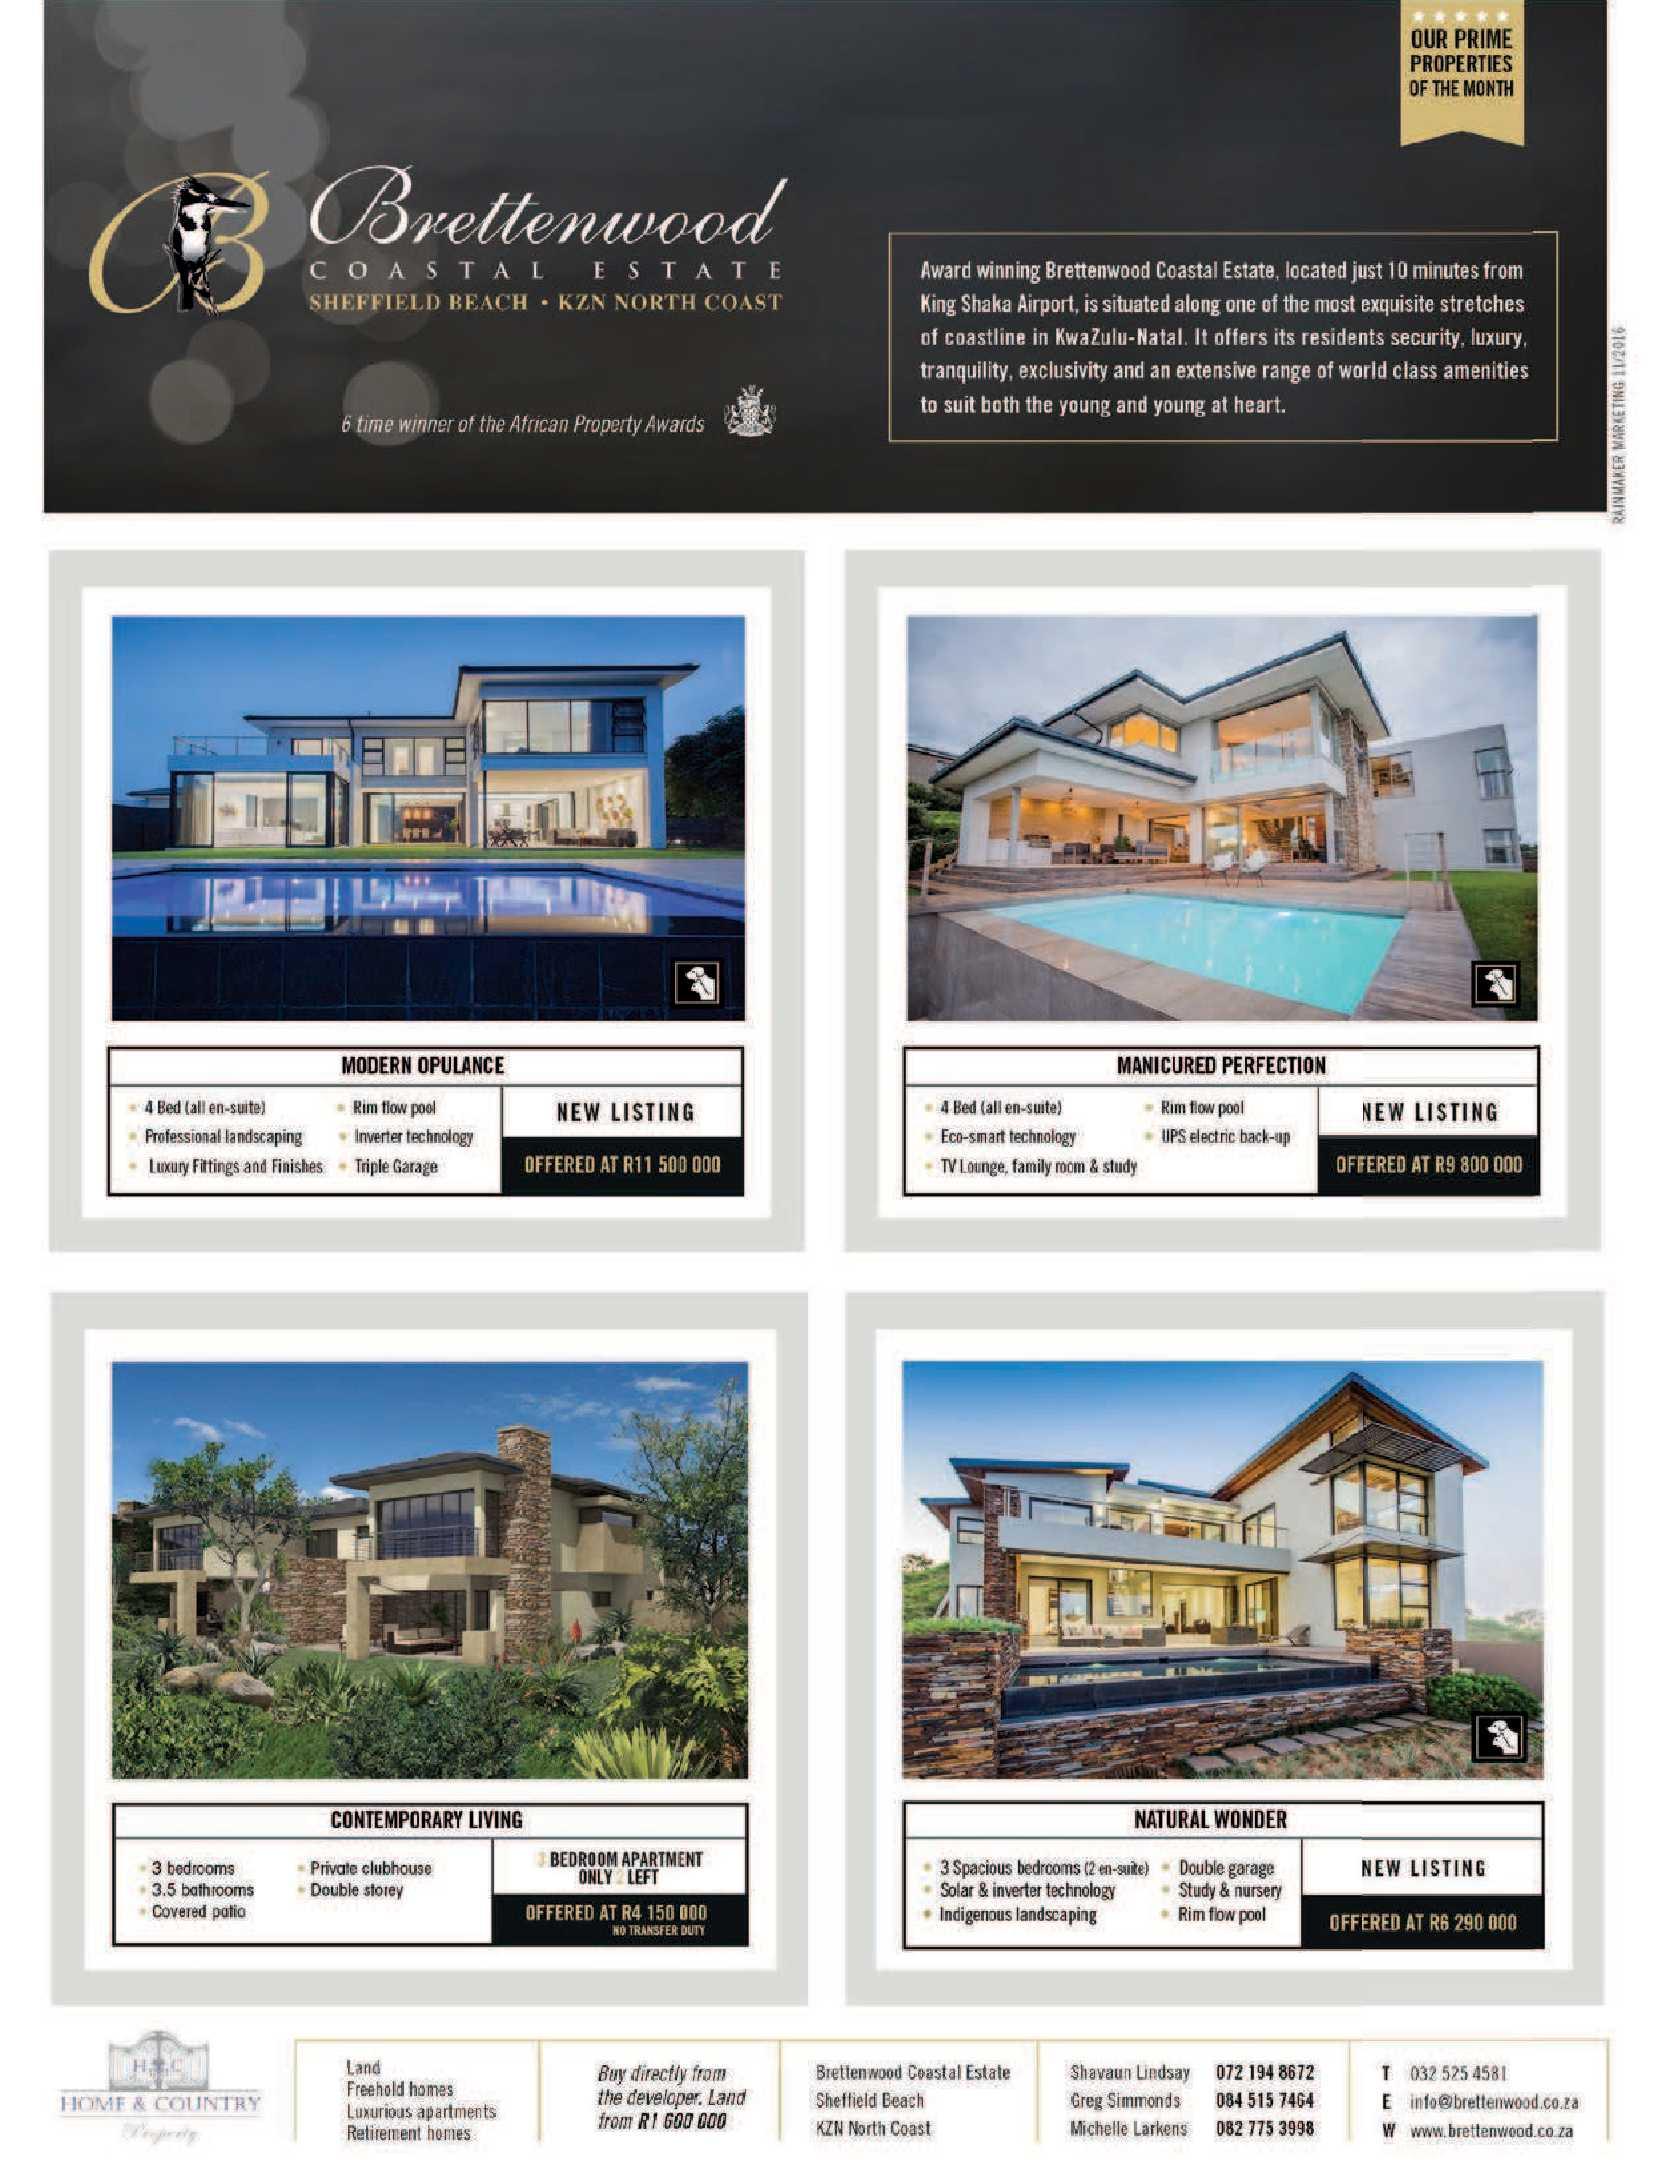 get-magazine-ballitoumhlanga-december-2016-january-2017-epapers-page-83